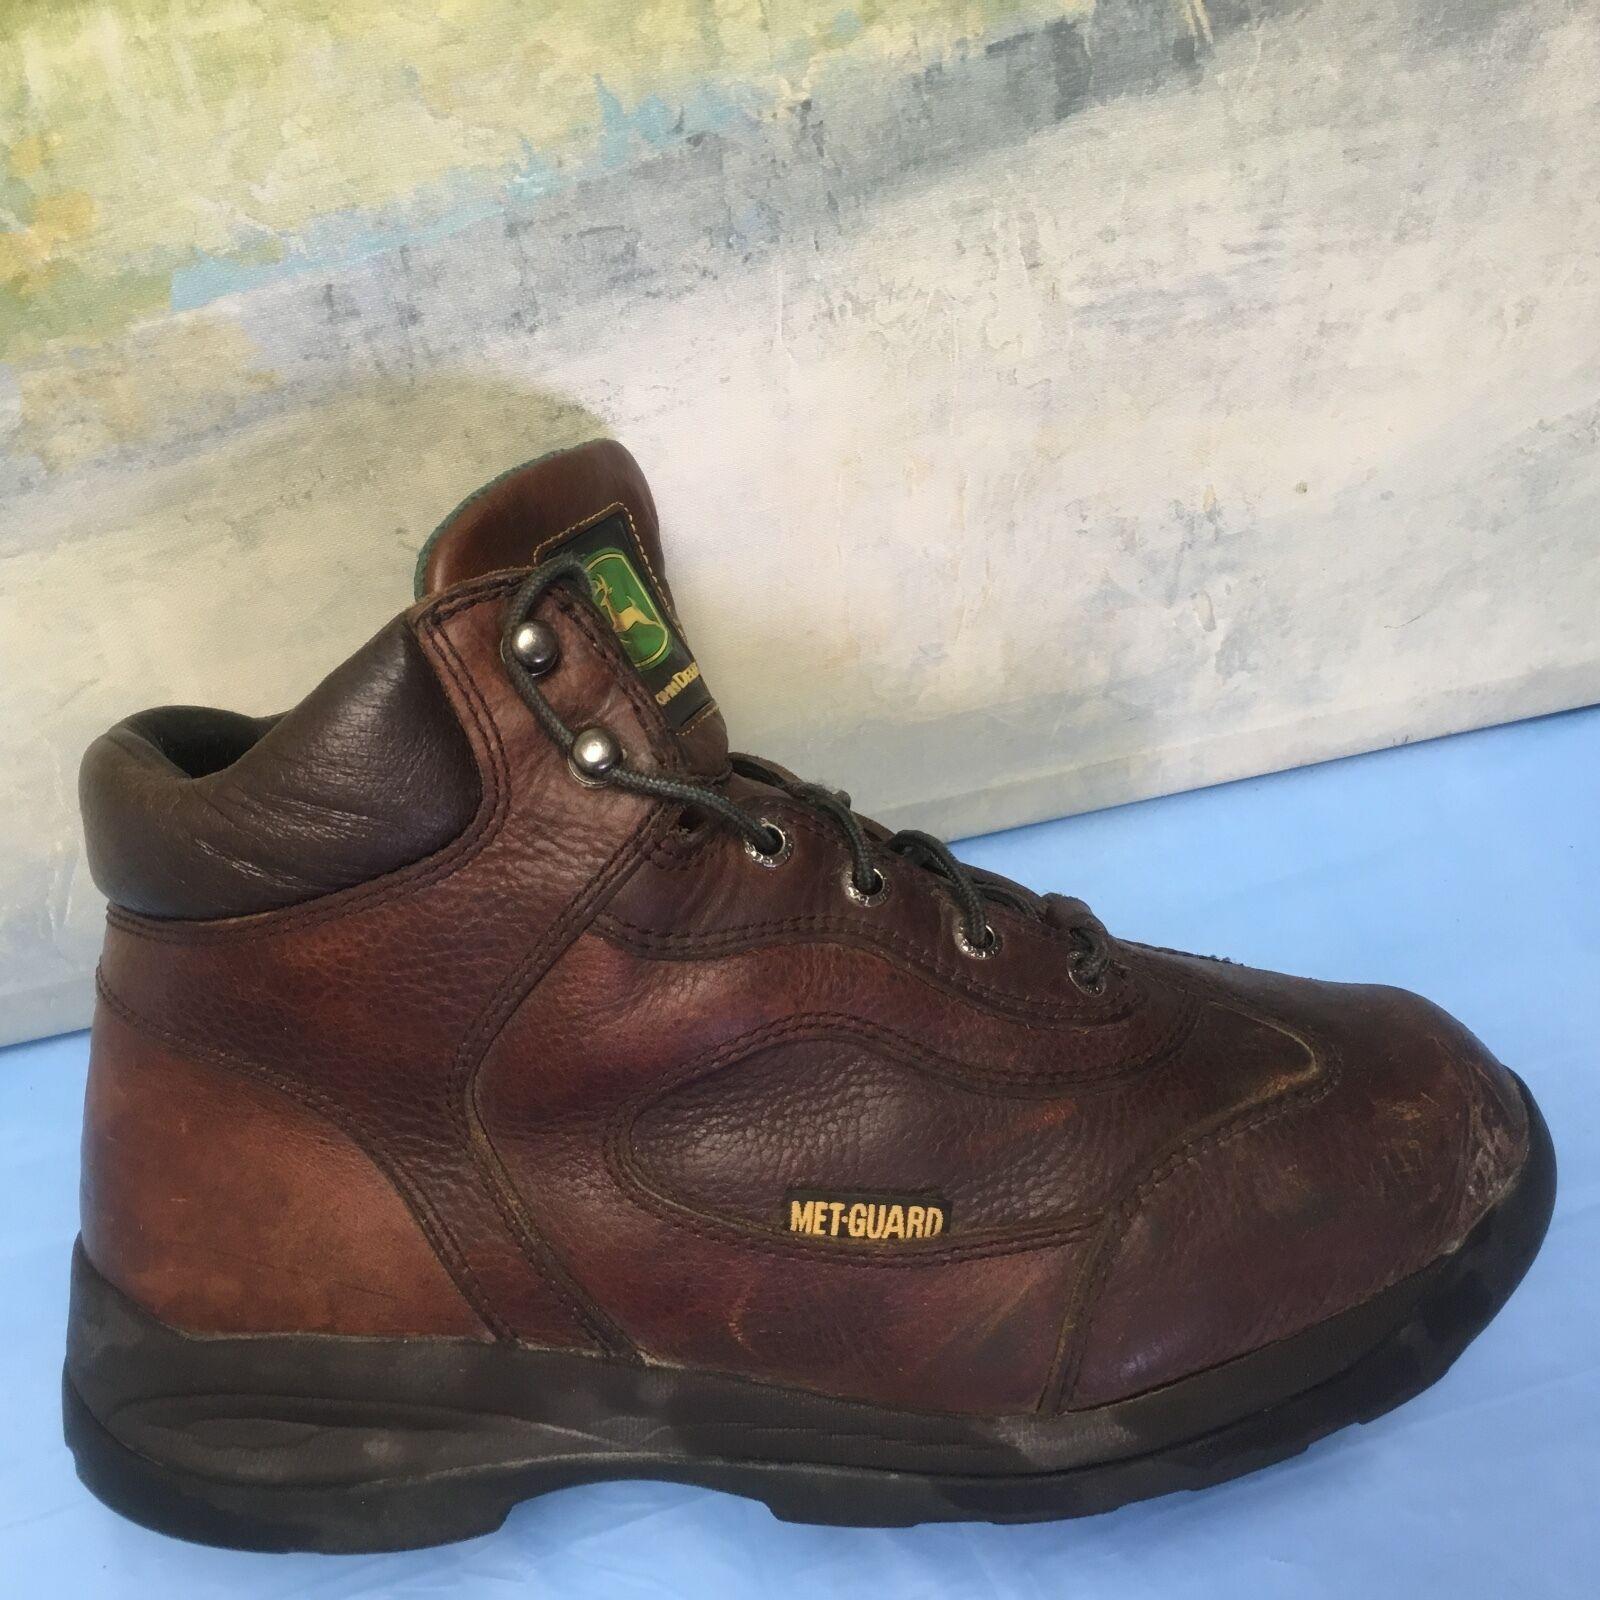 John Deere steel toe MET GUARD boots US 10.5 M JD3664